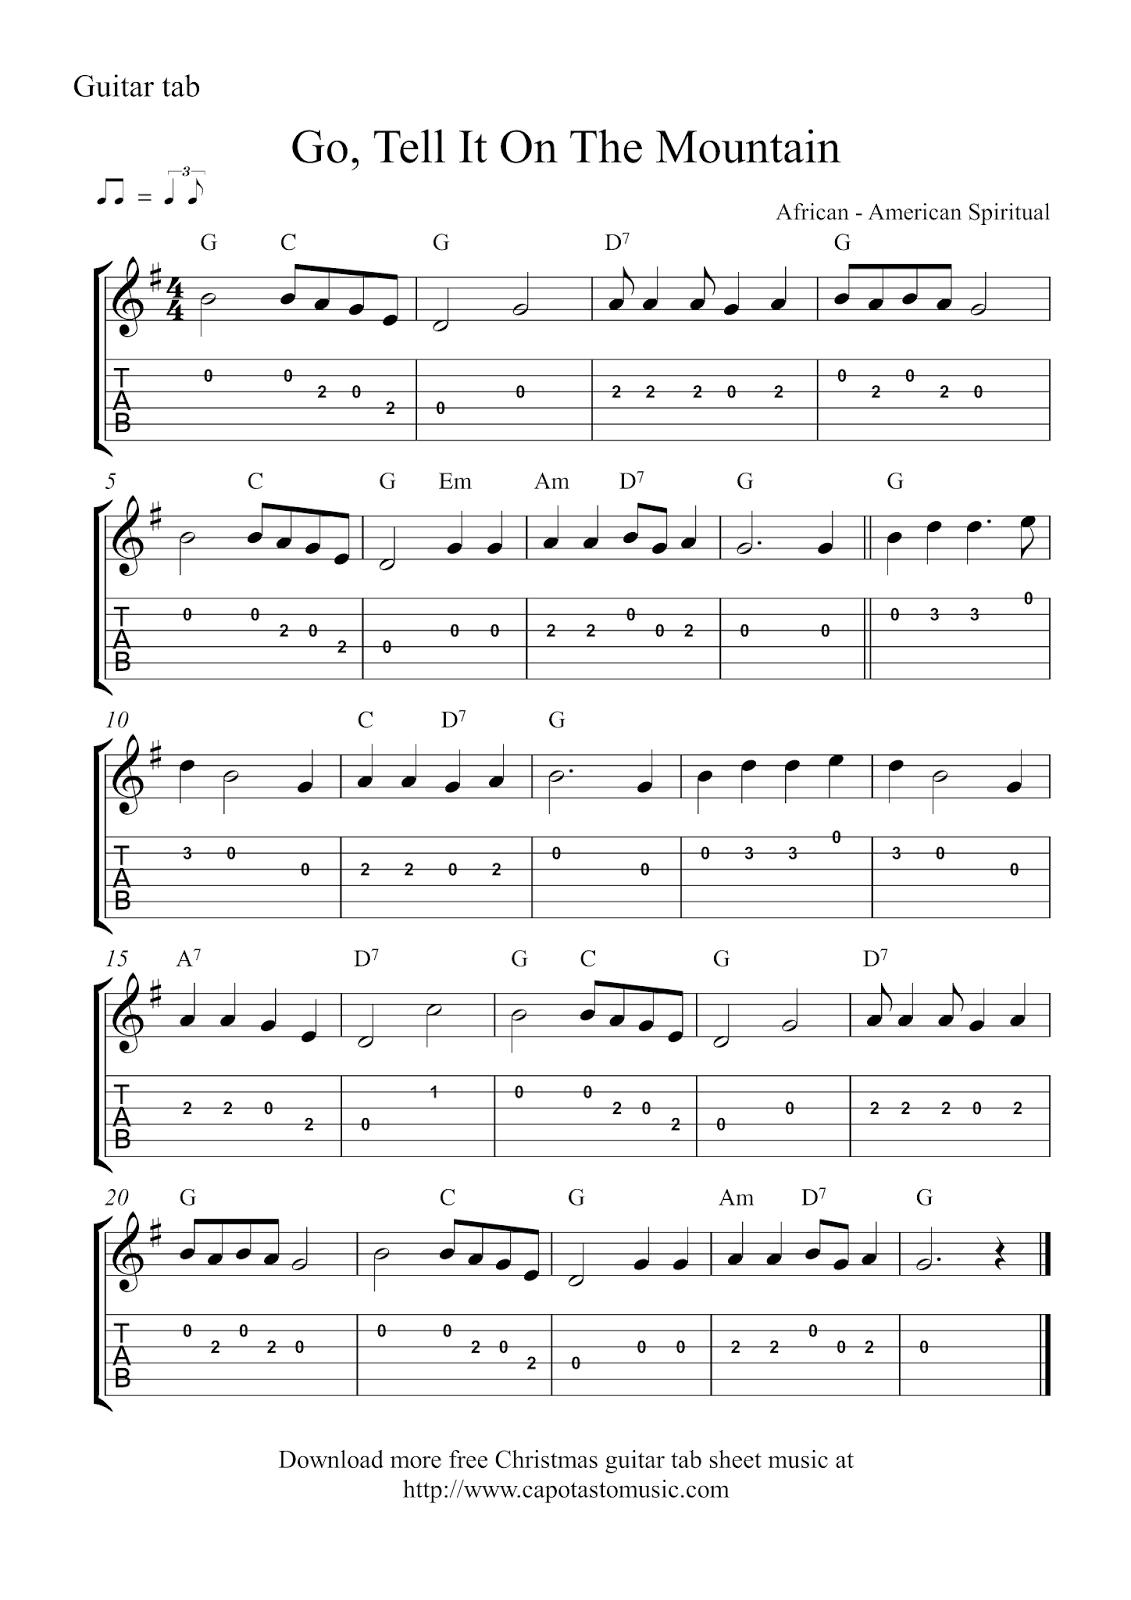 Free Christmas Guitar Tab Sheet Music - silent night sheet music and score on ...